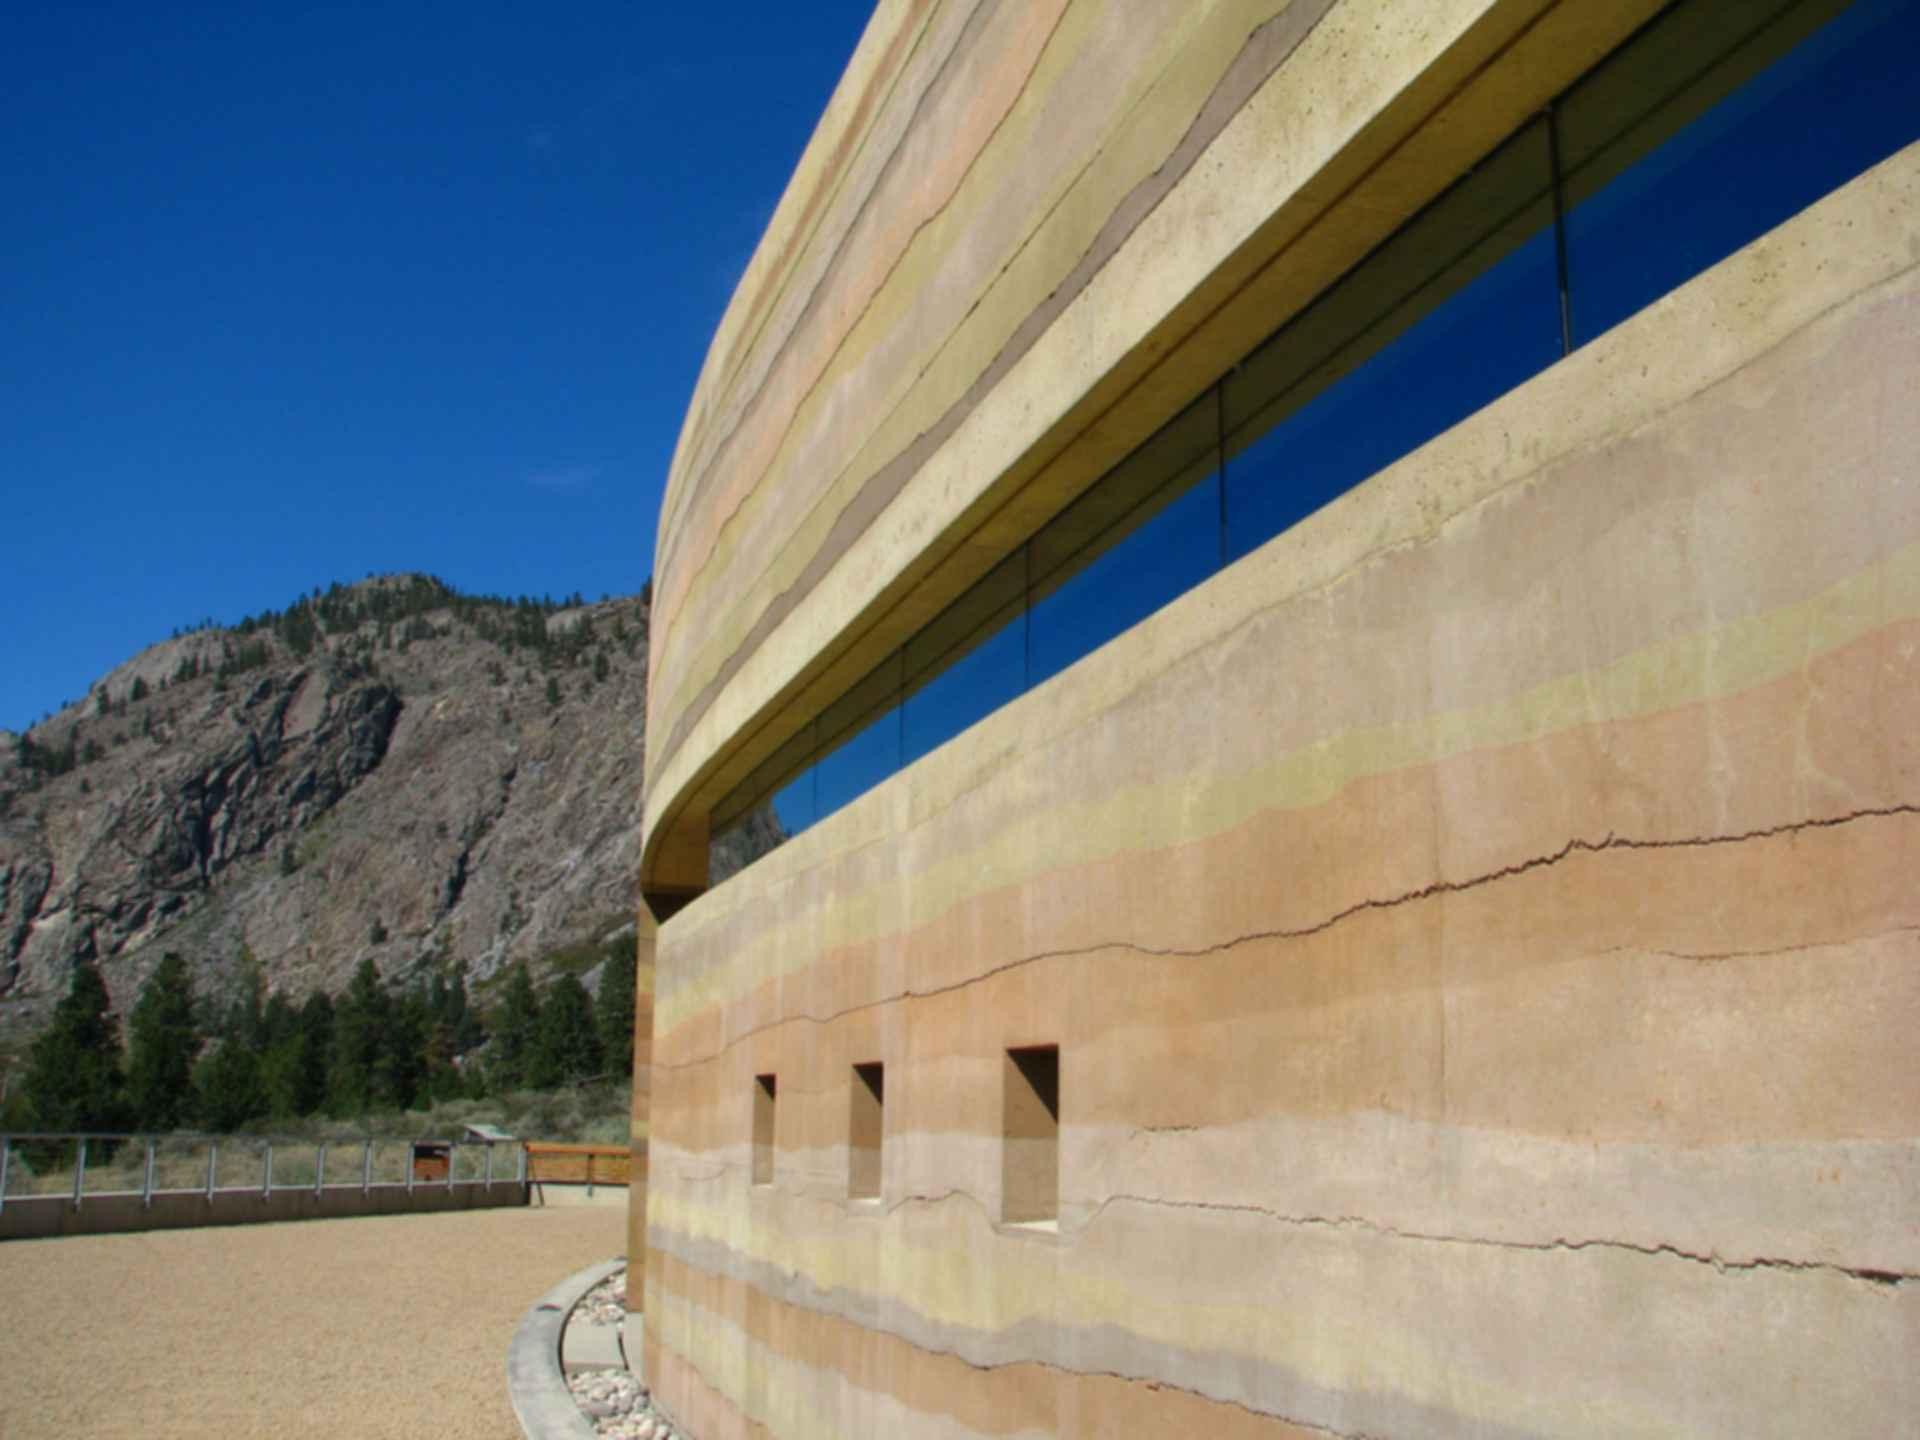 Nk'Mip Desert Cultural Centre - Exterior